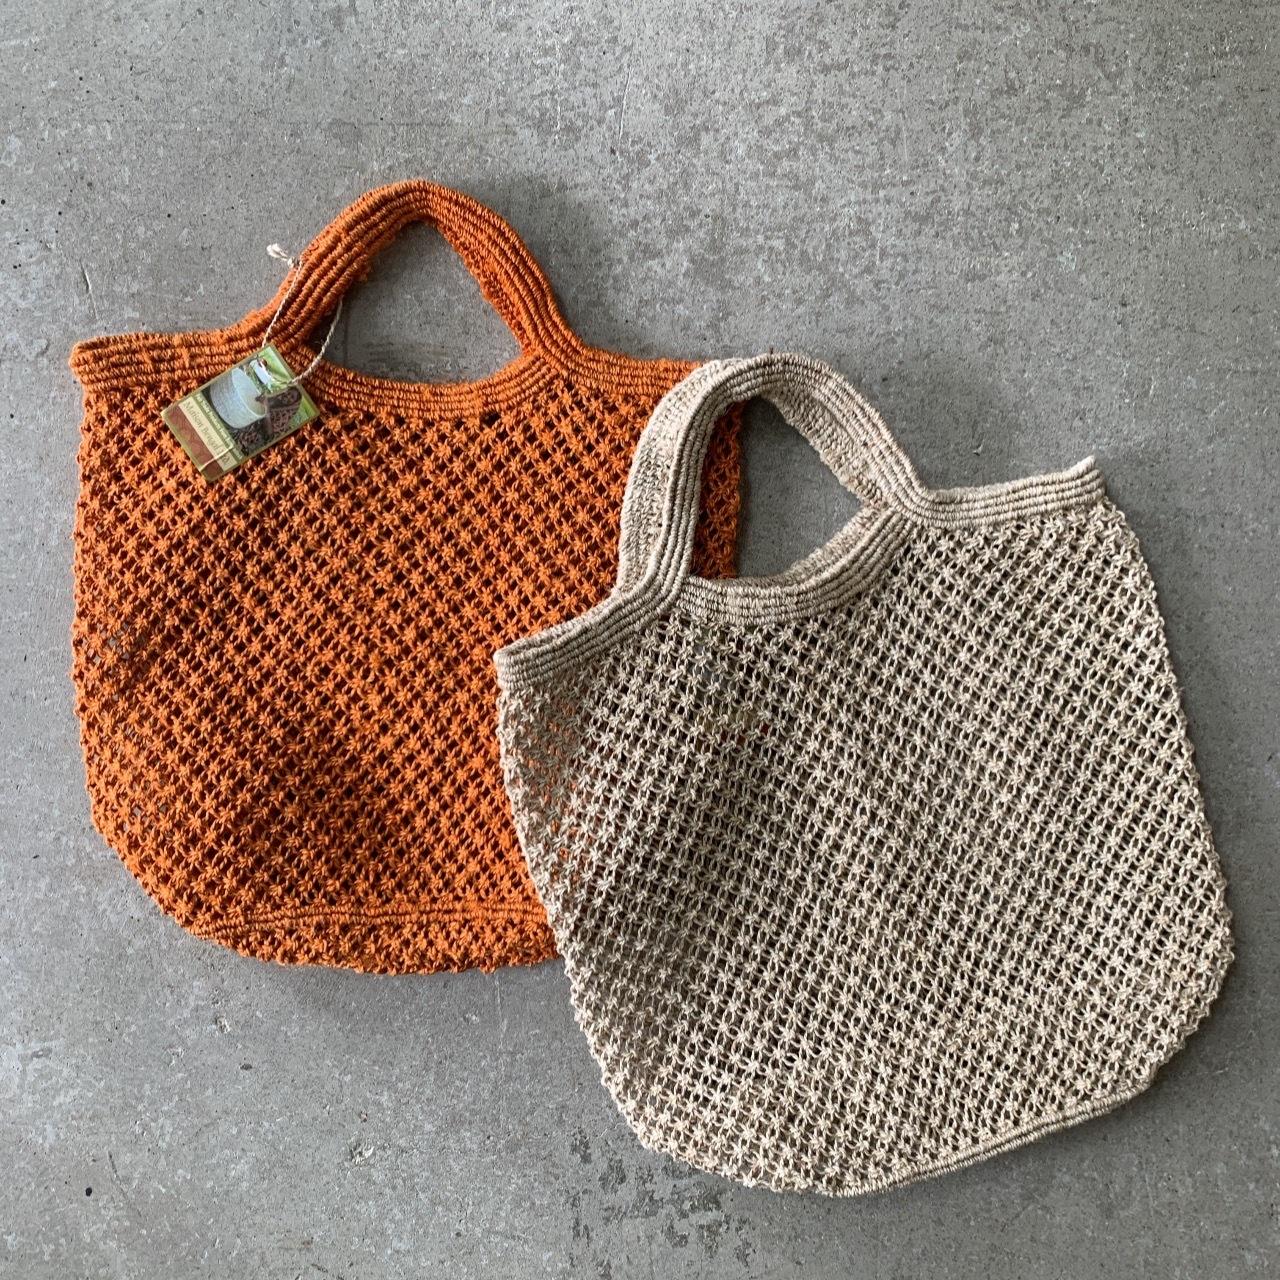 Maison Bengal - Jute Macrame Bag Large